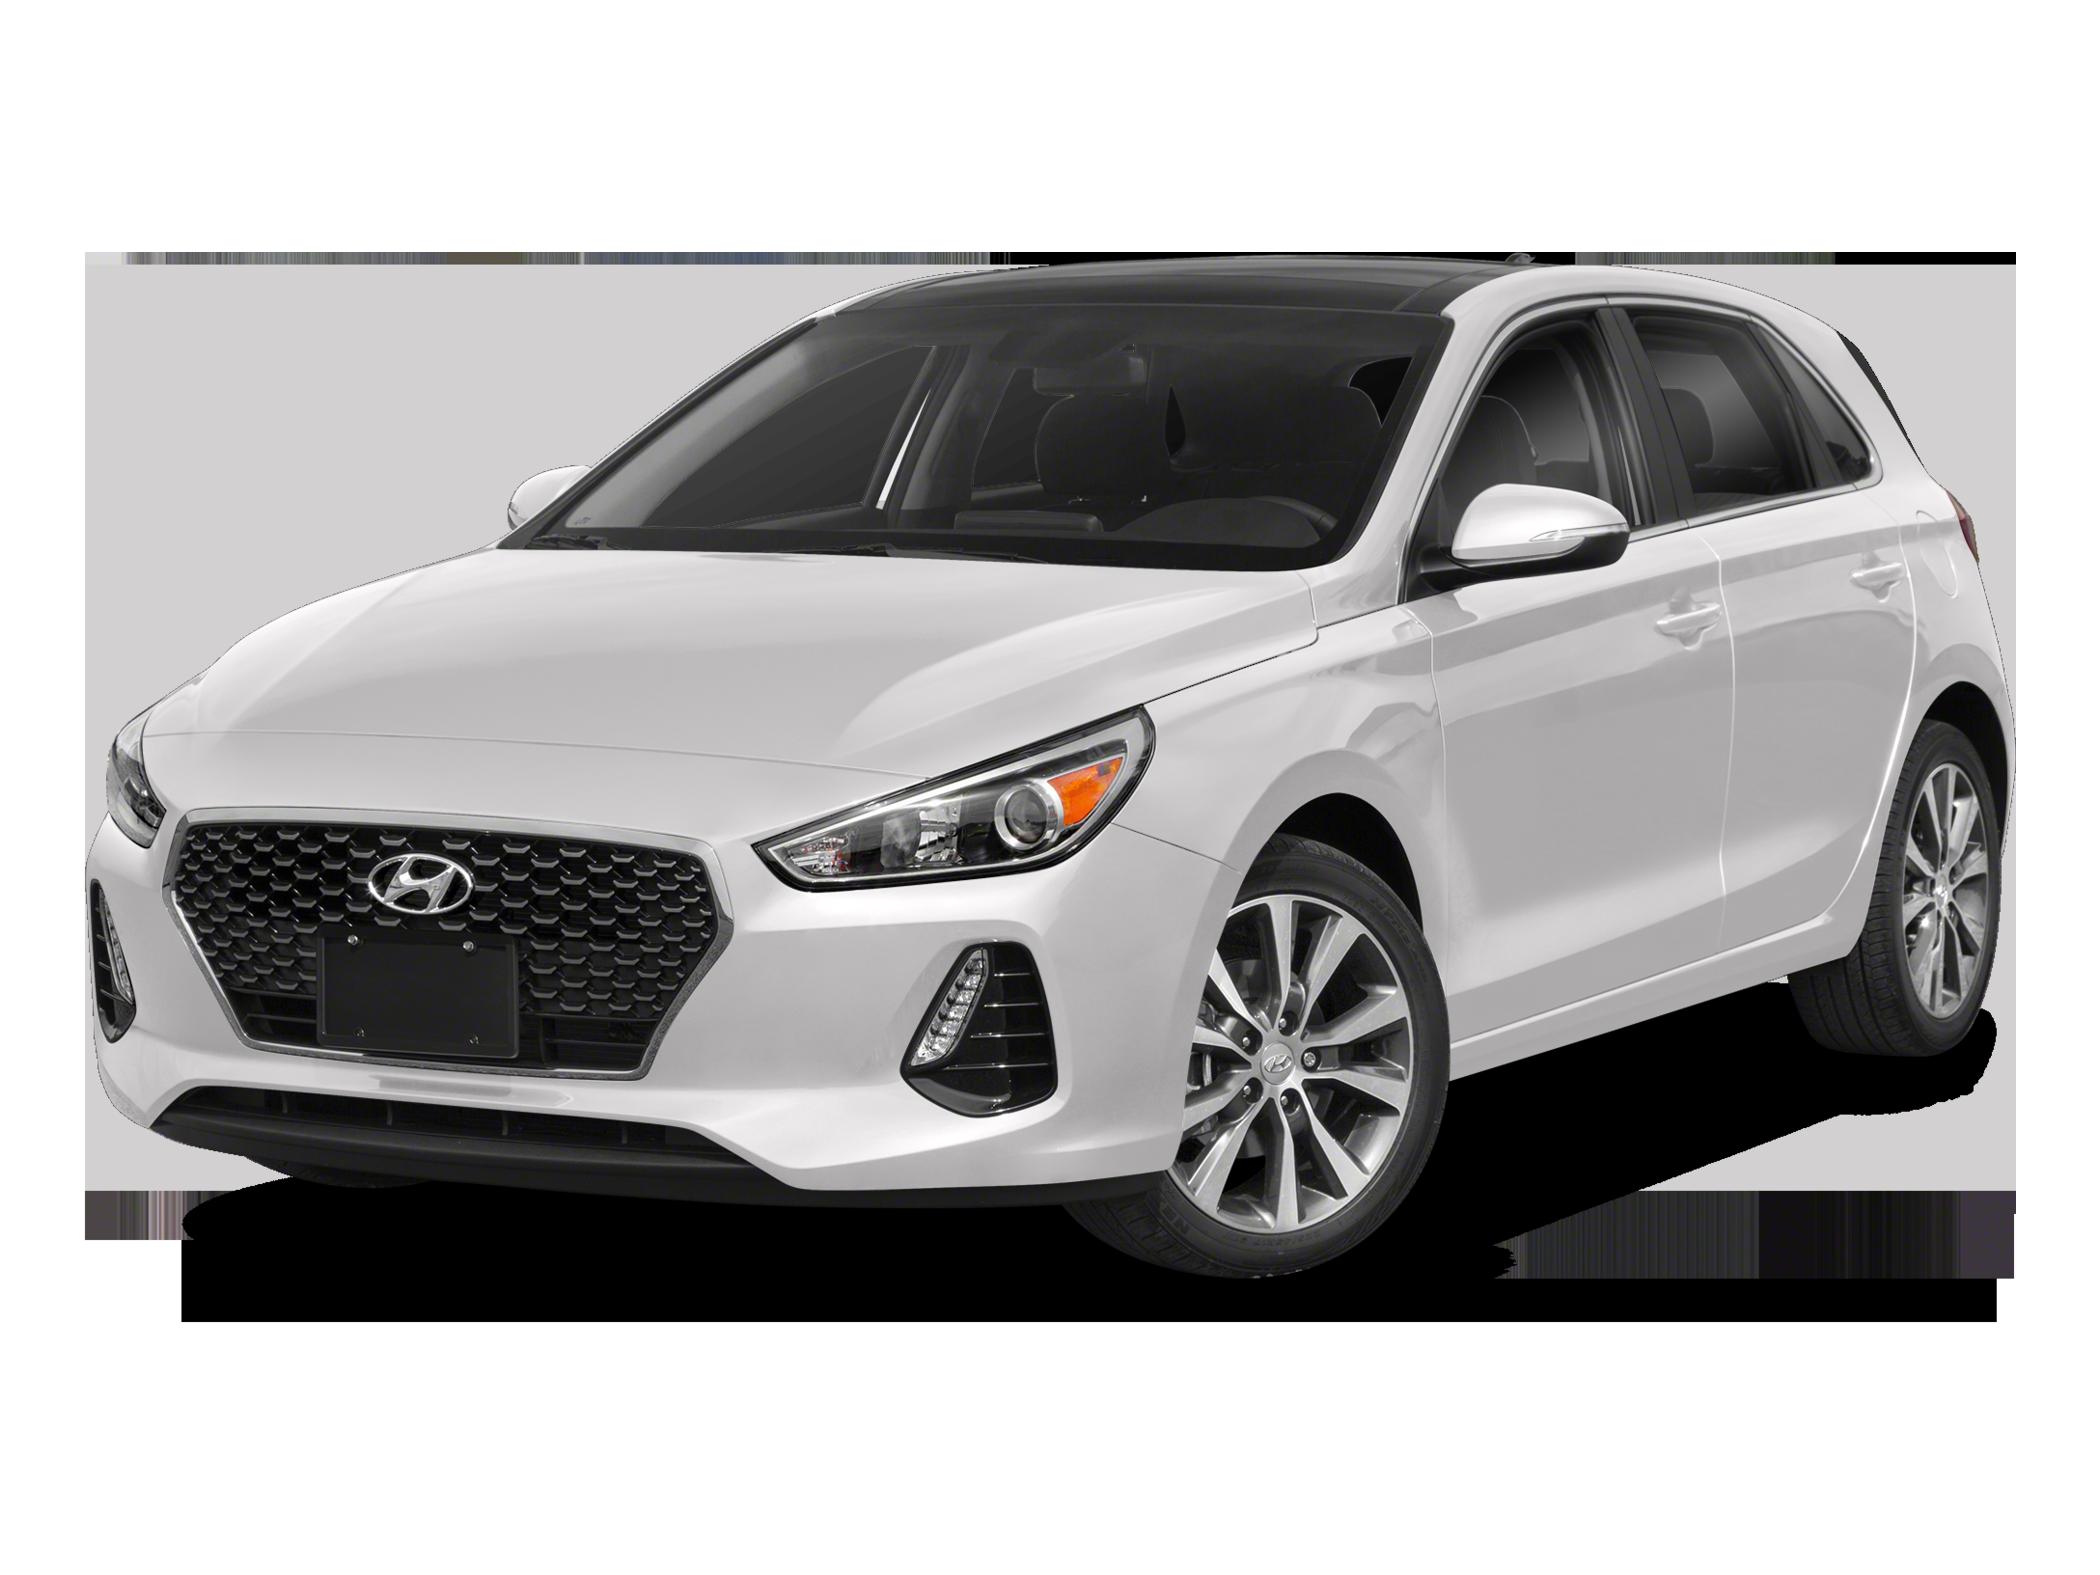 2018 Hyundai Elantra GT GLS : Price, Specs & Review ...